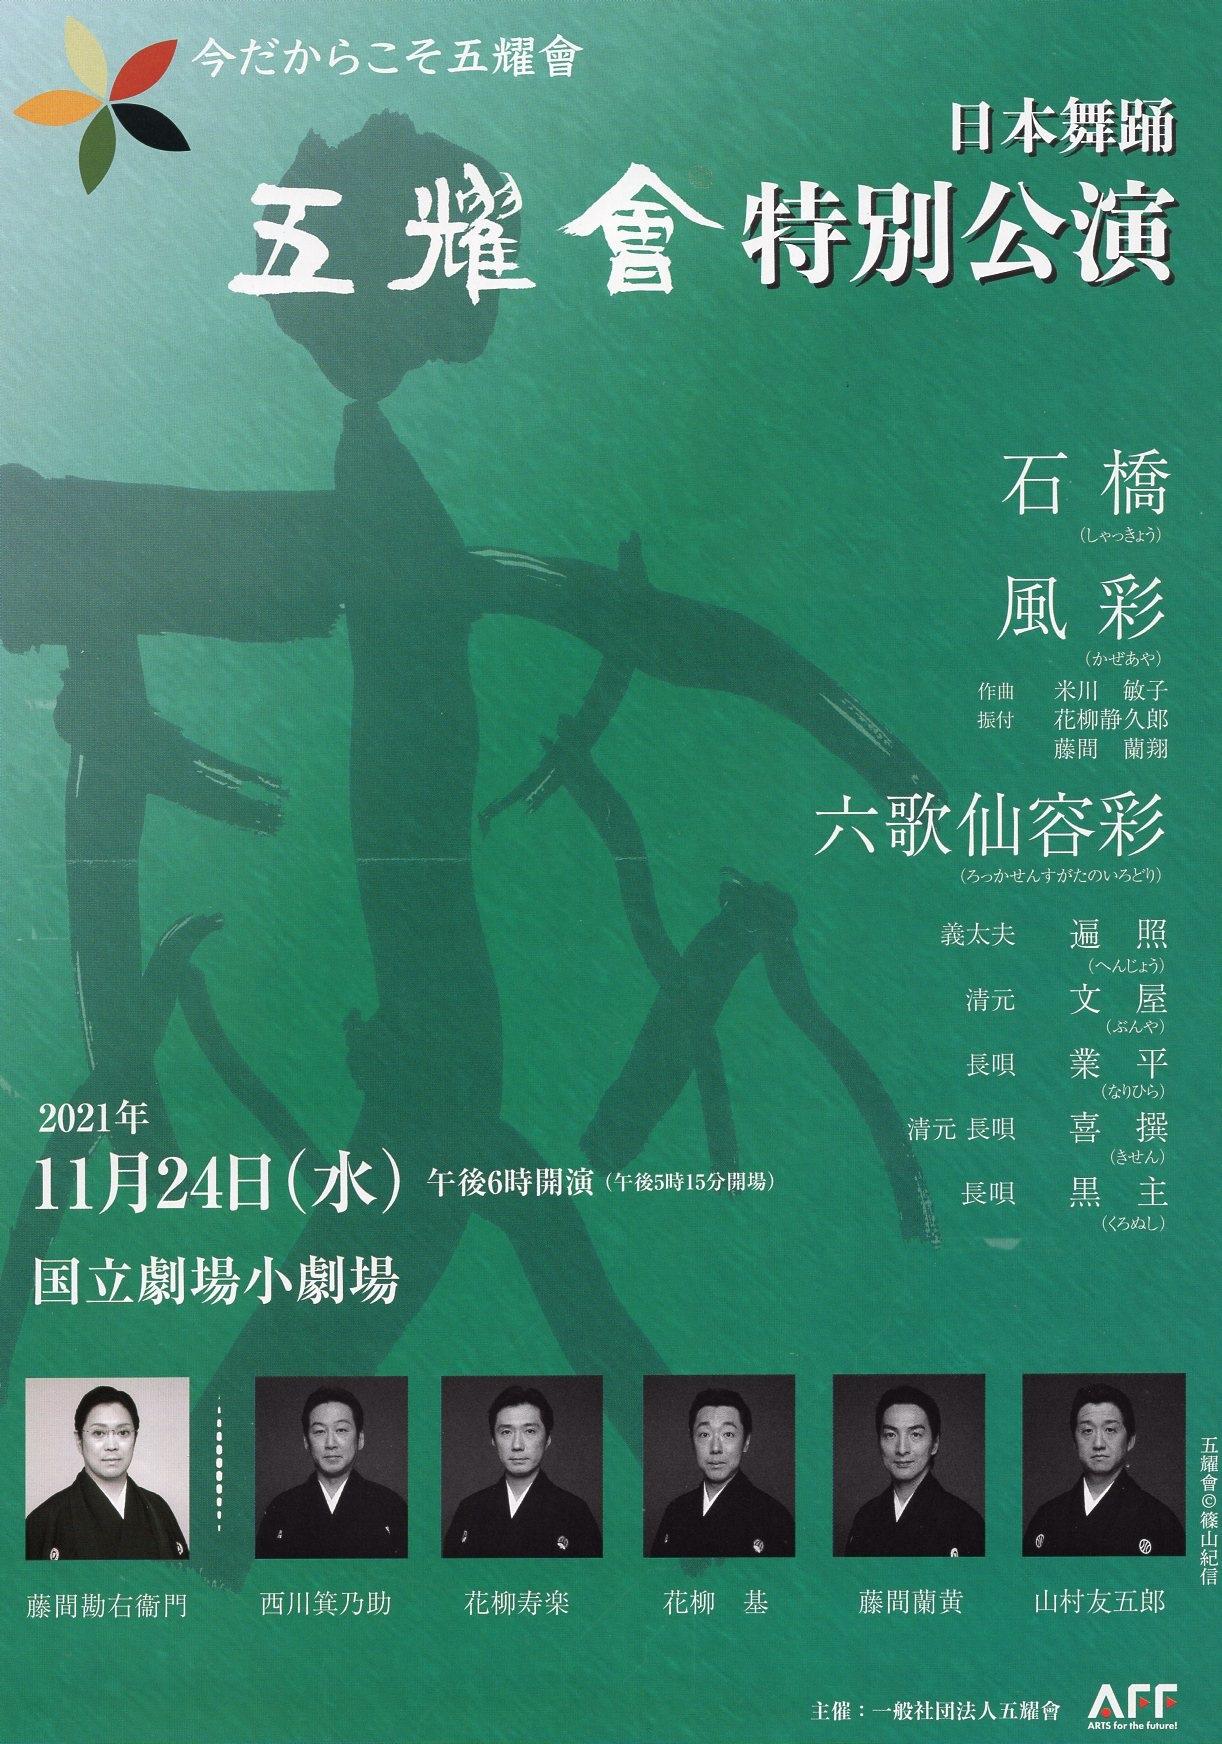 日本舞踊「五耀會特別公演」ポスター